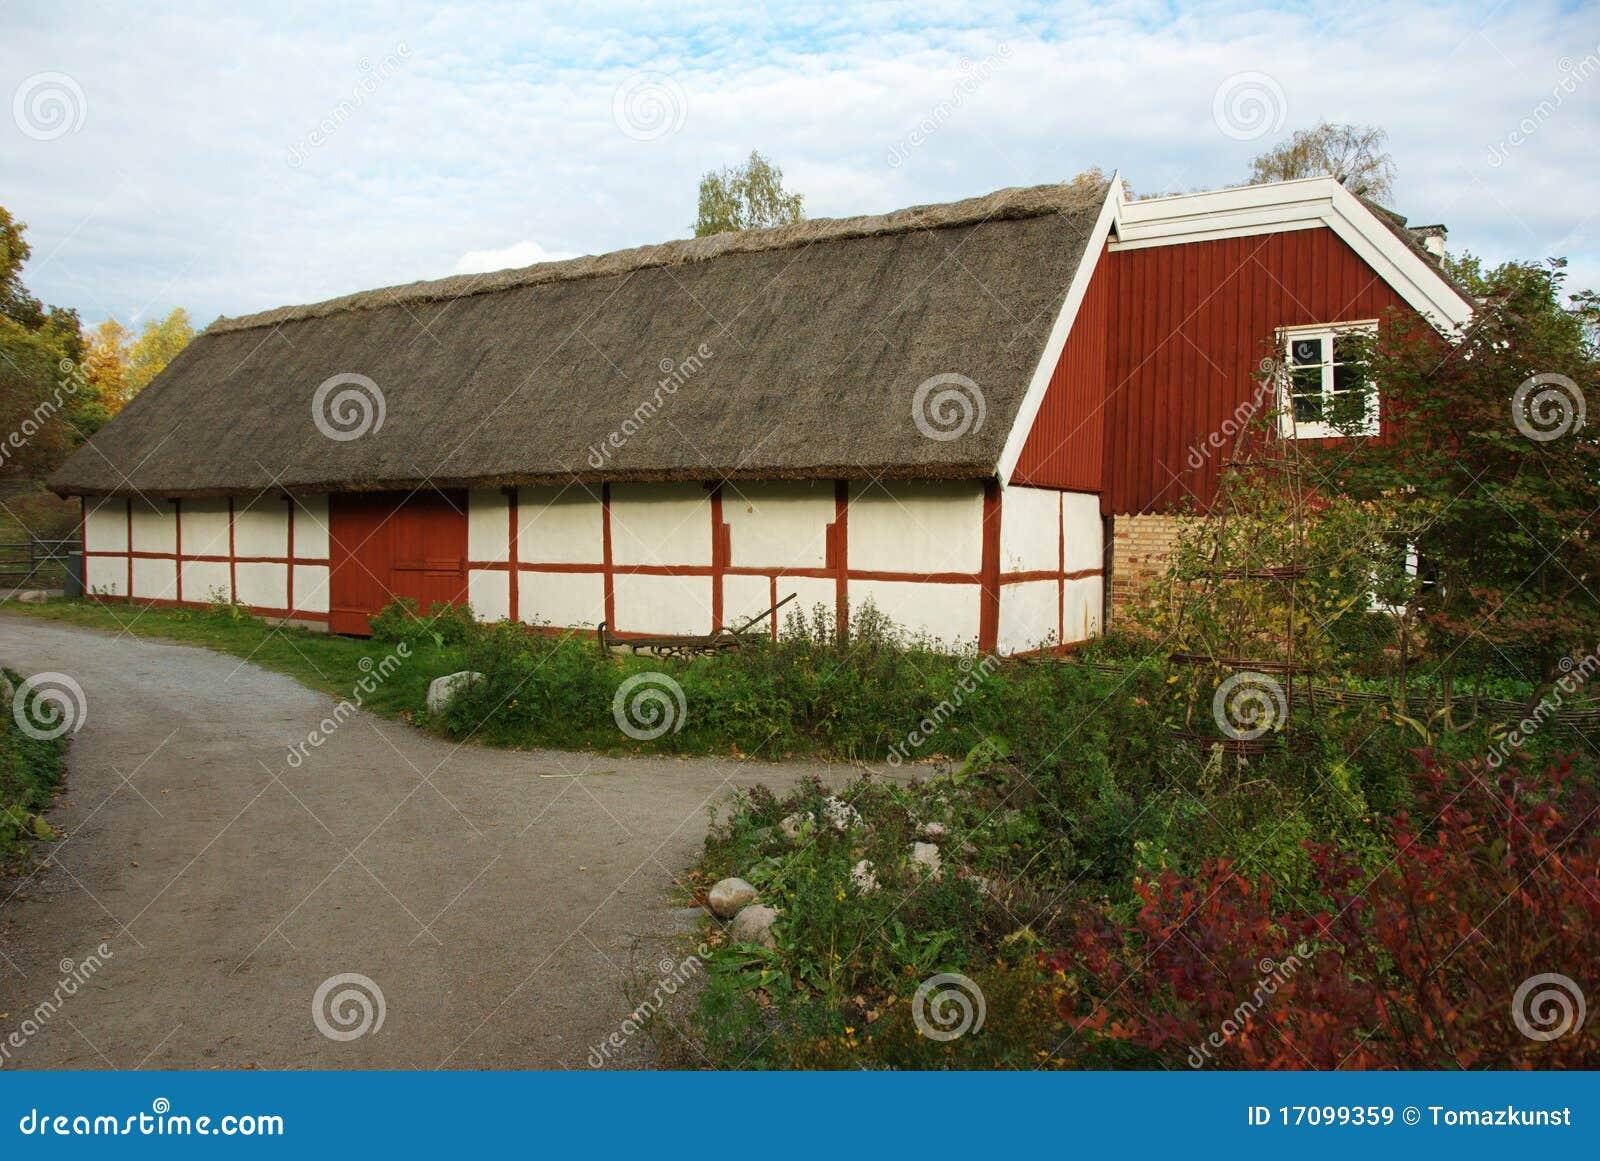 Skansen - Dorfhalle